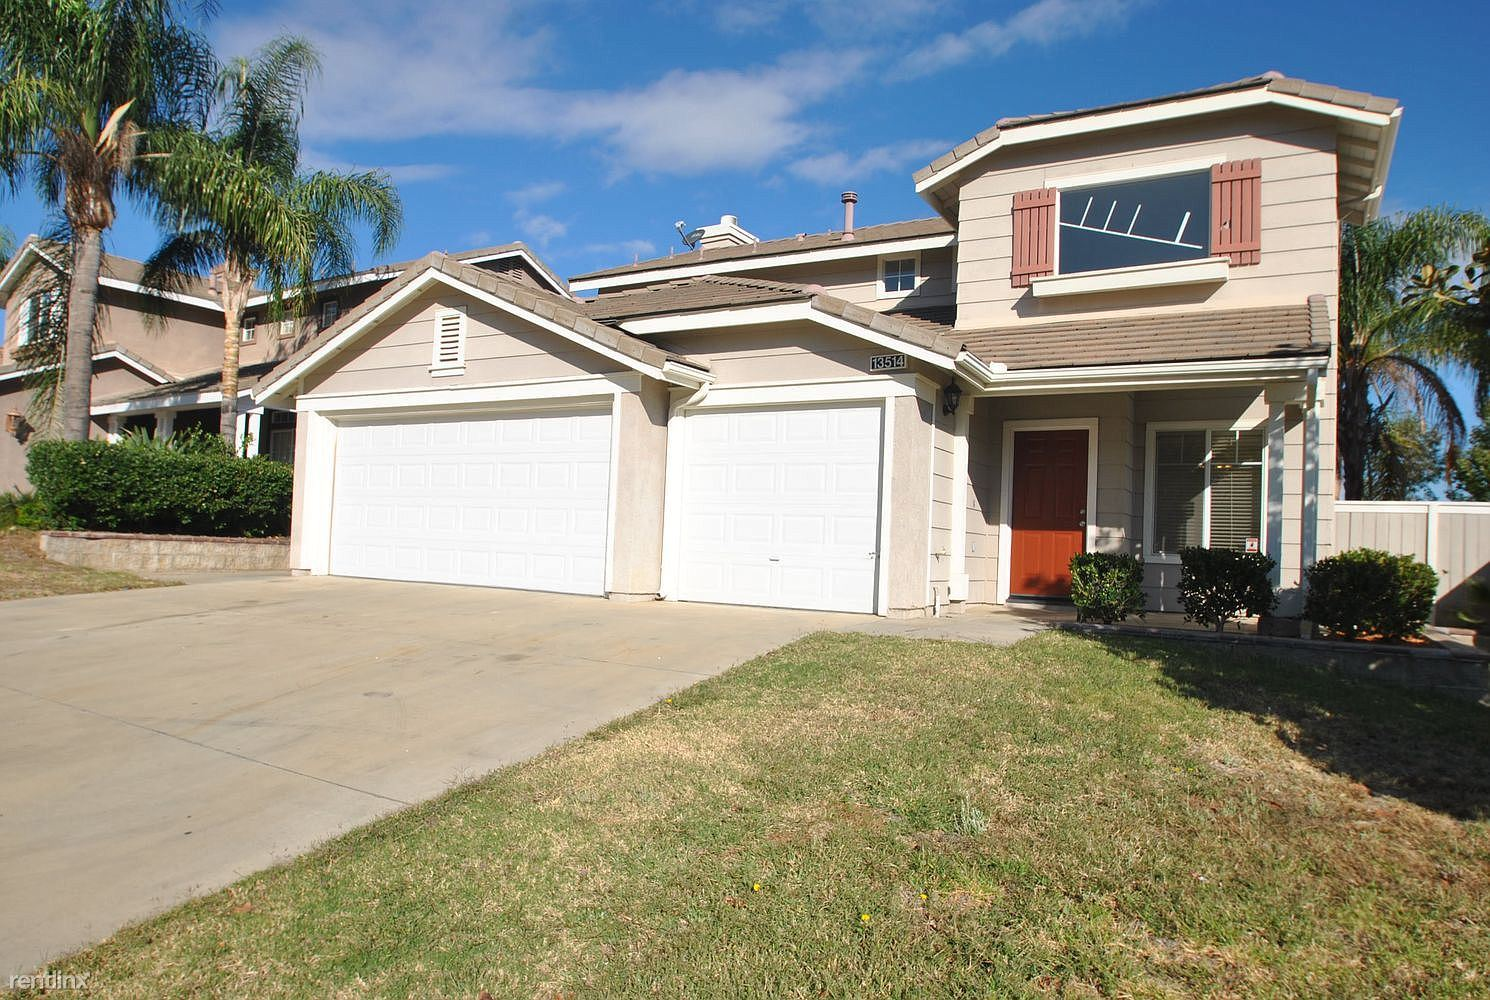 13514 Fairfield Dr, Corona, CA - $2,800 USD/ month